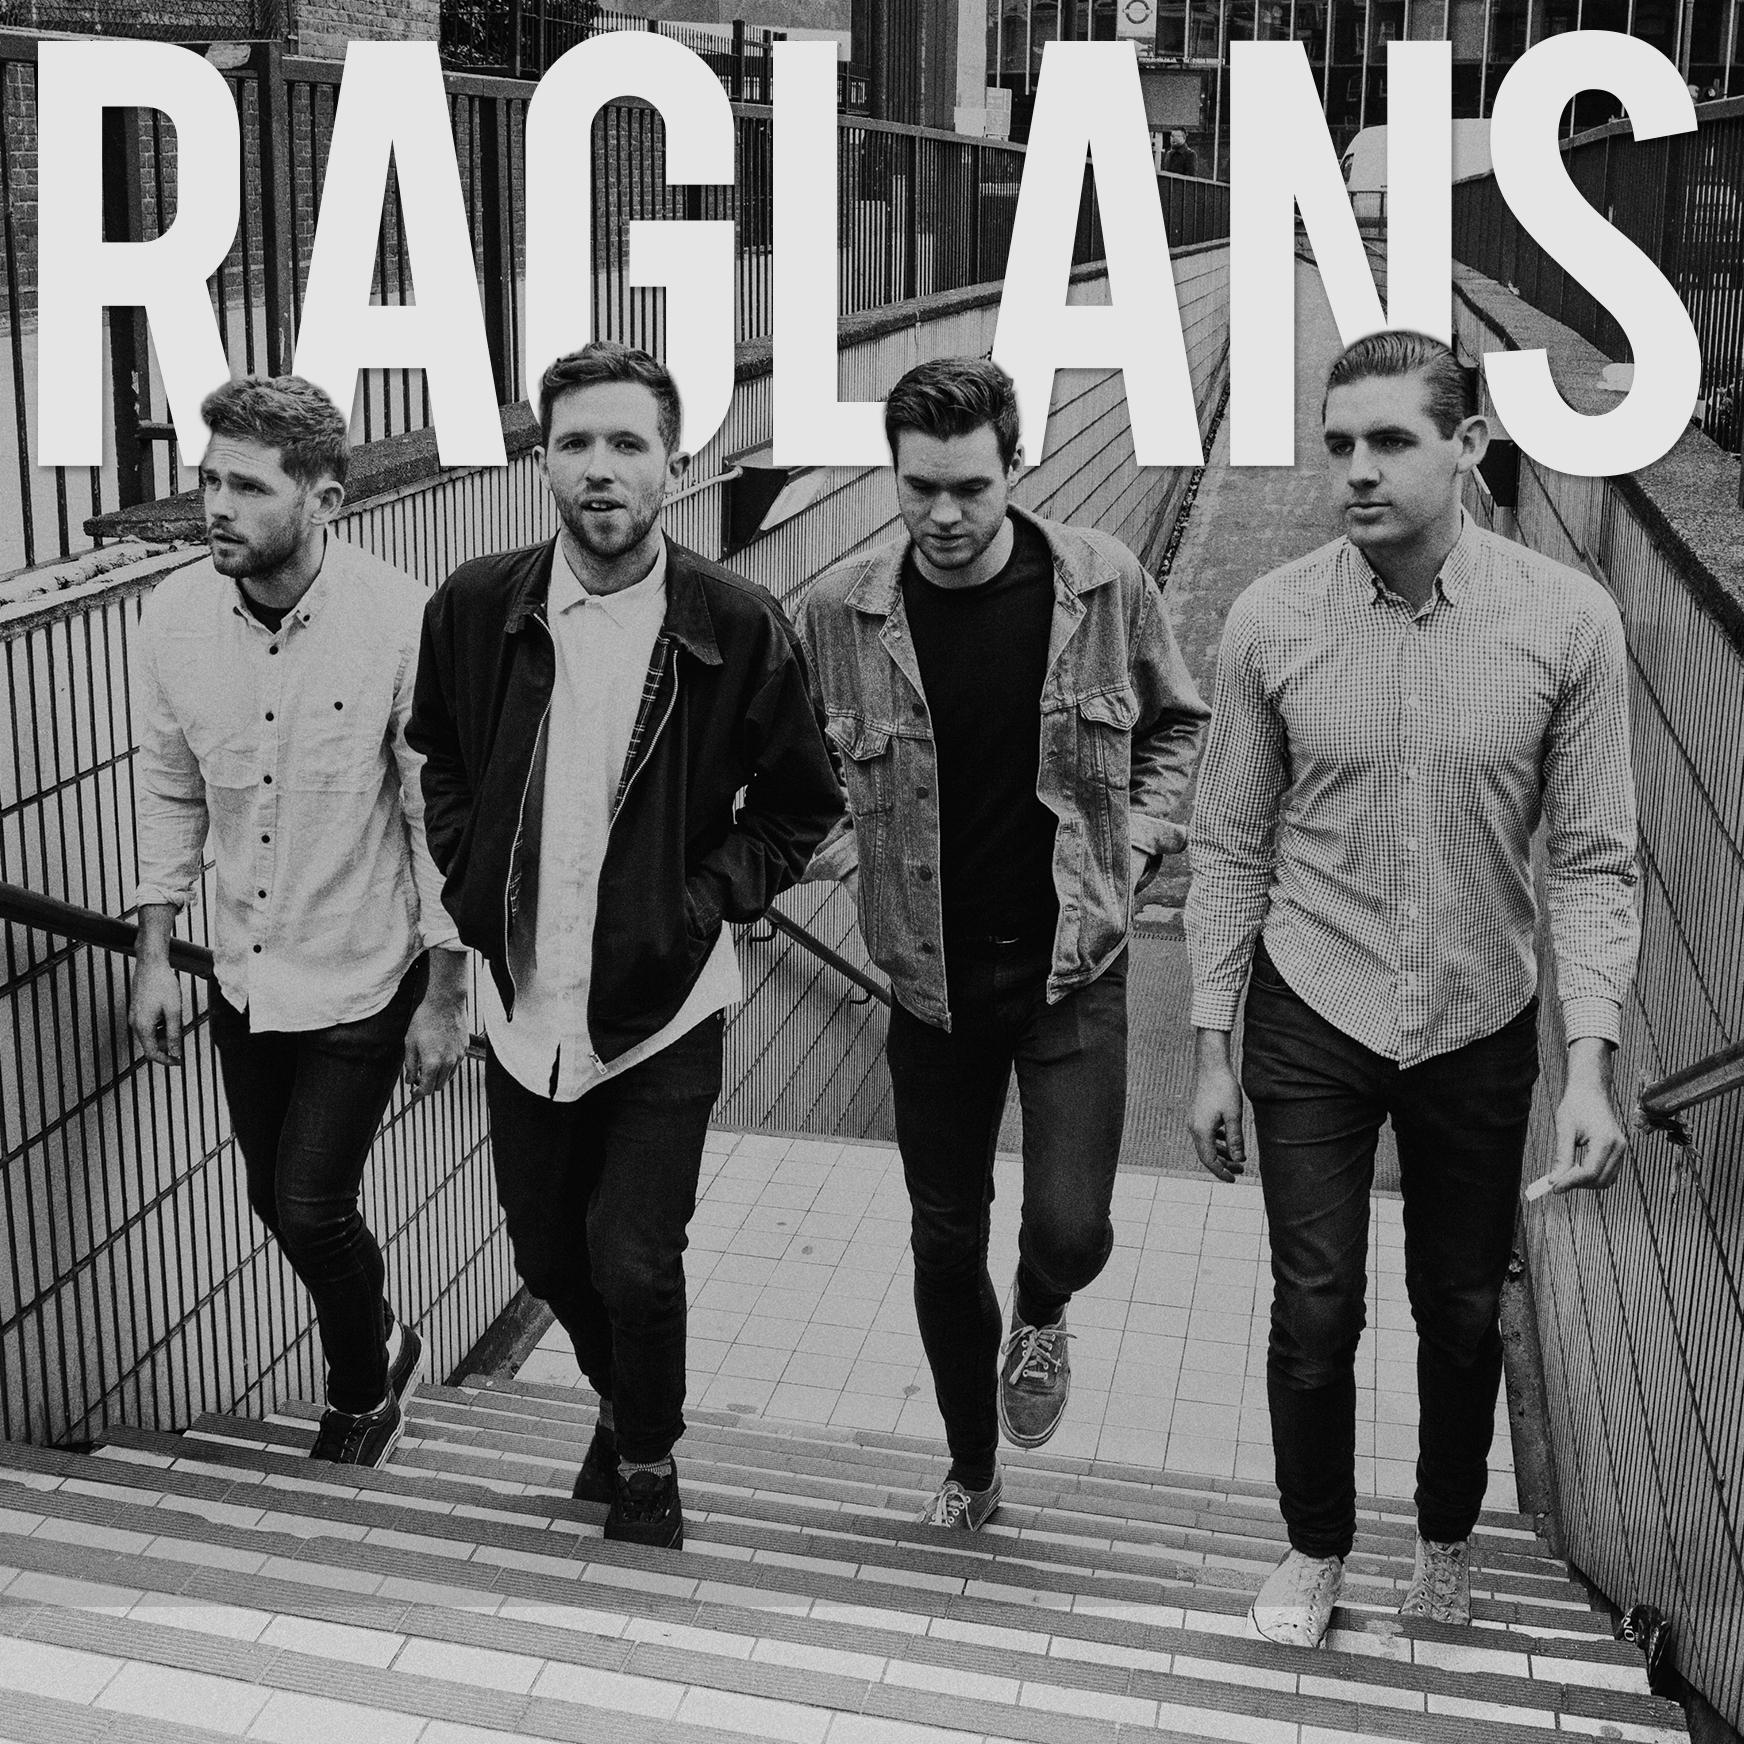 raglans - Producer/Engineer